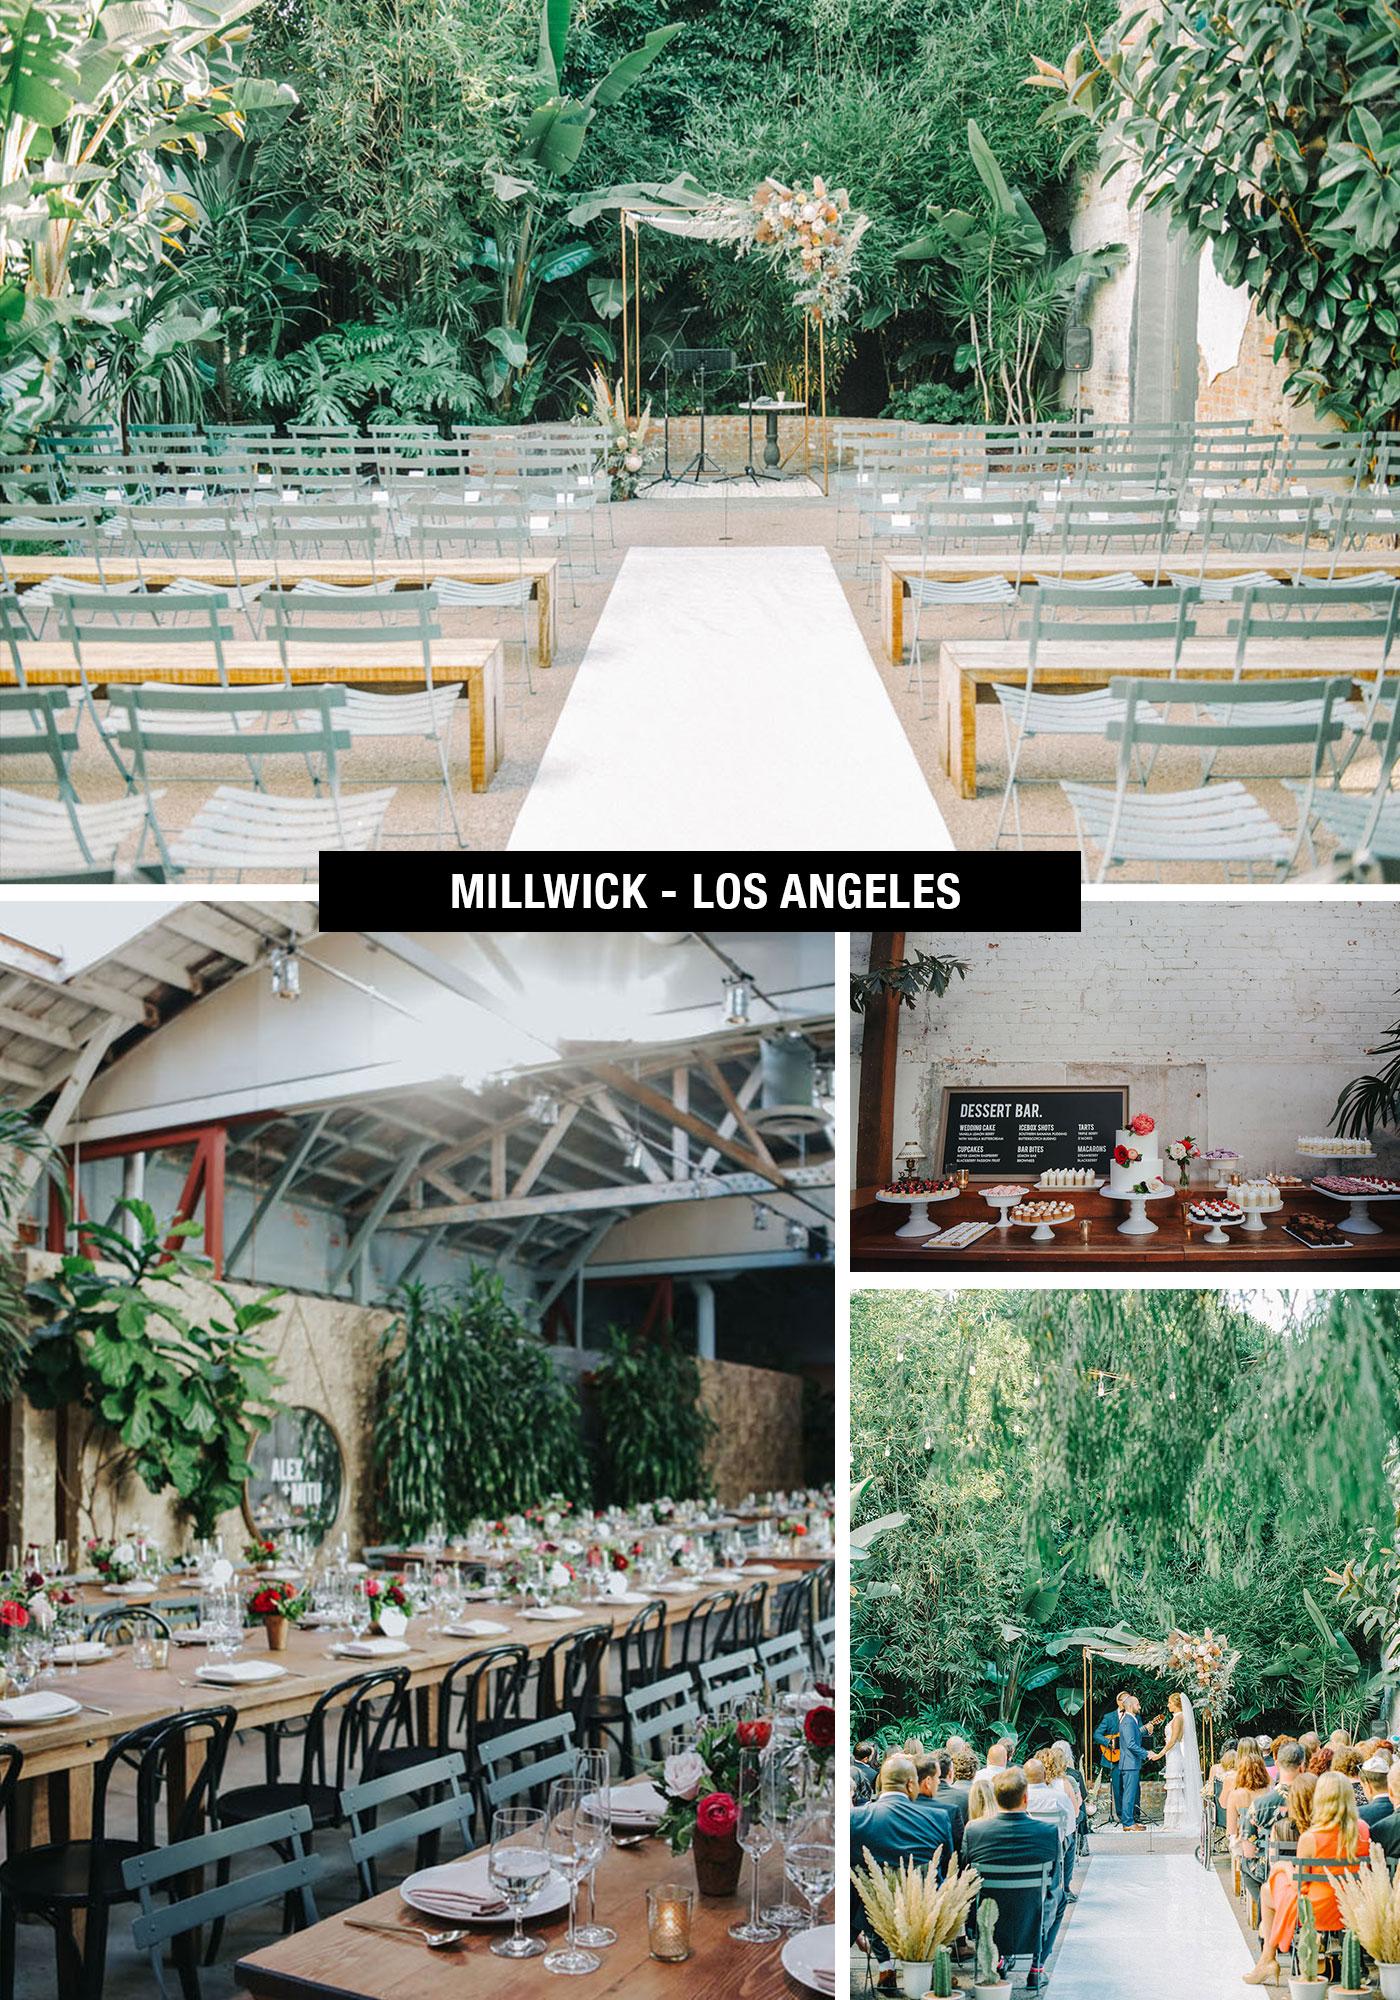 Millwick Los Angeles